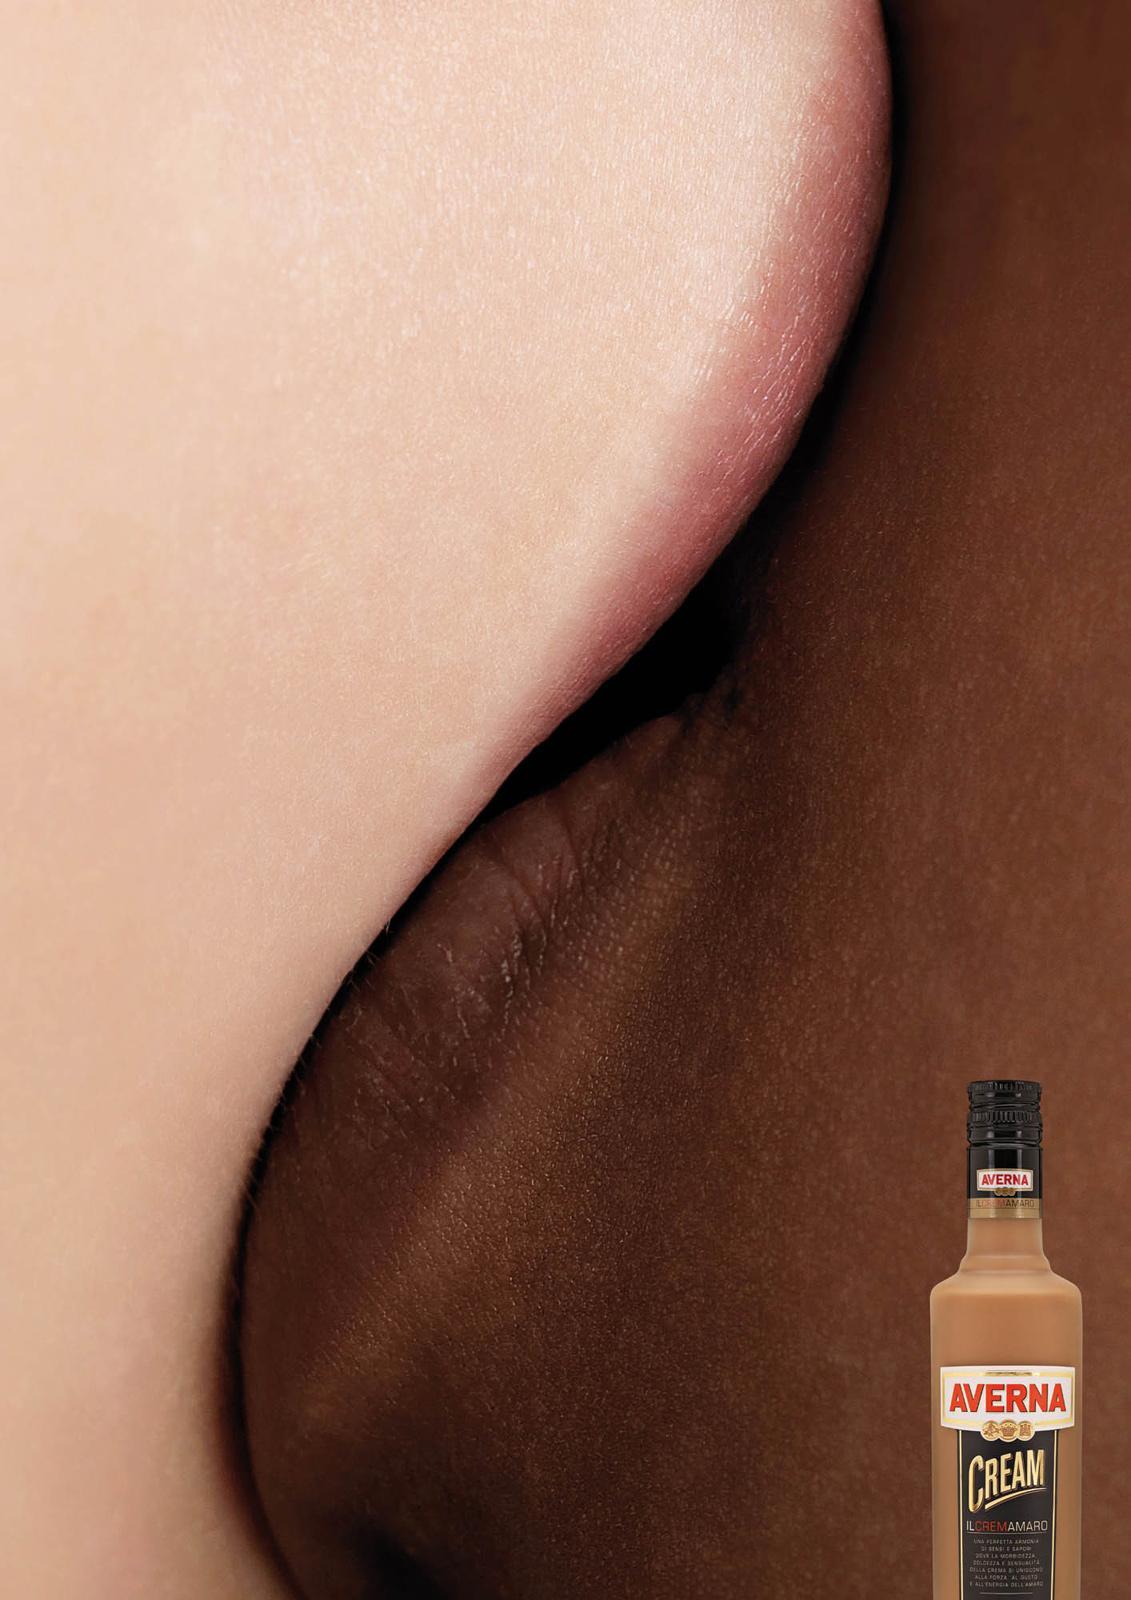 Averna Cream Print Ad -  Kiss